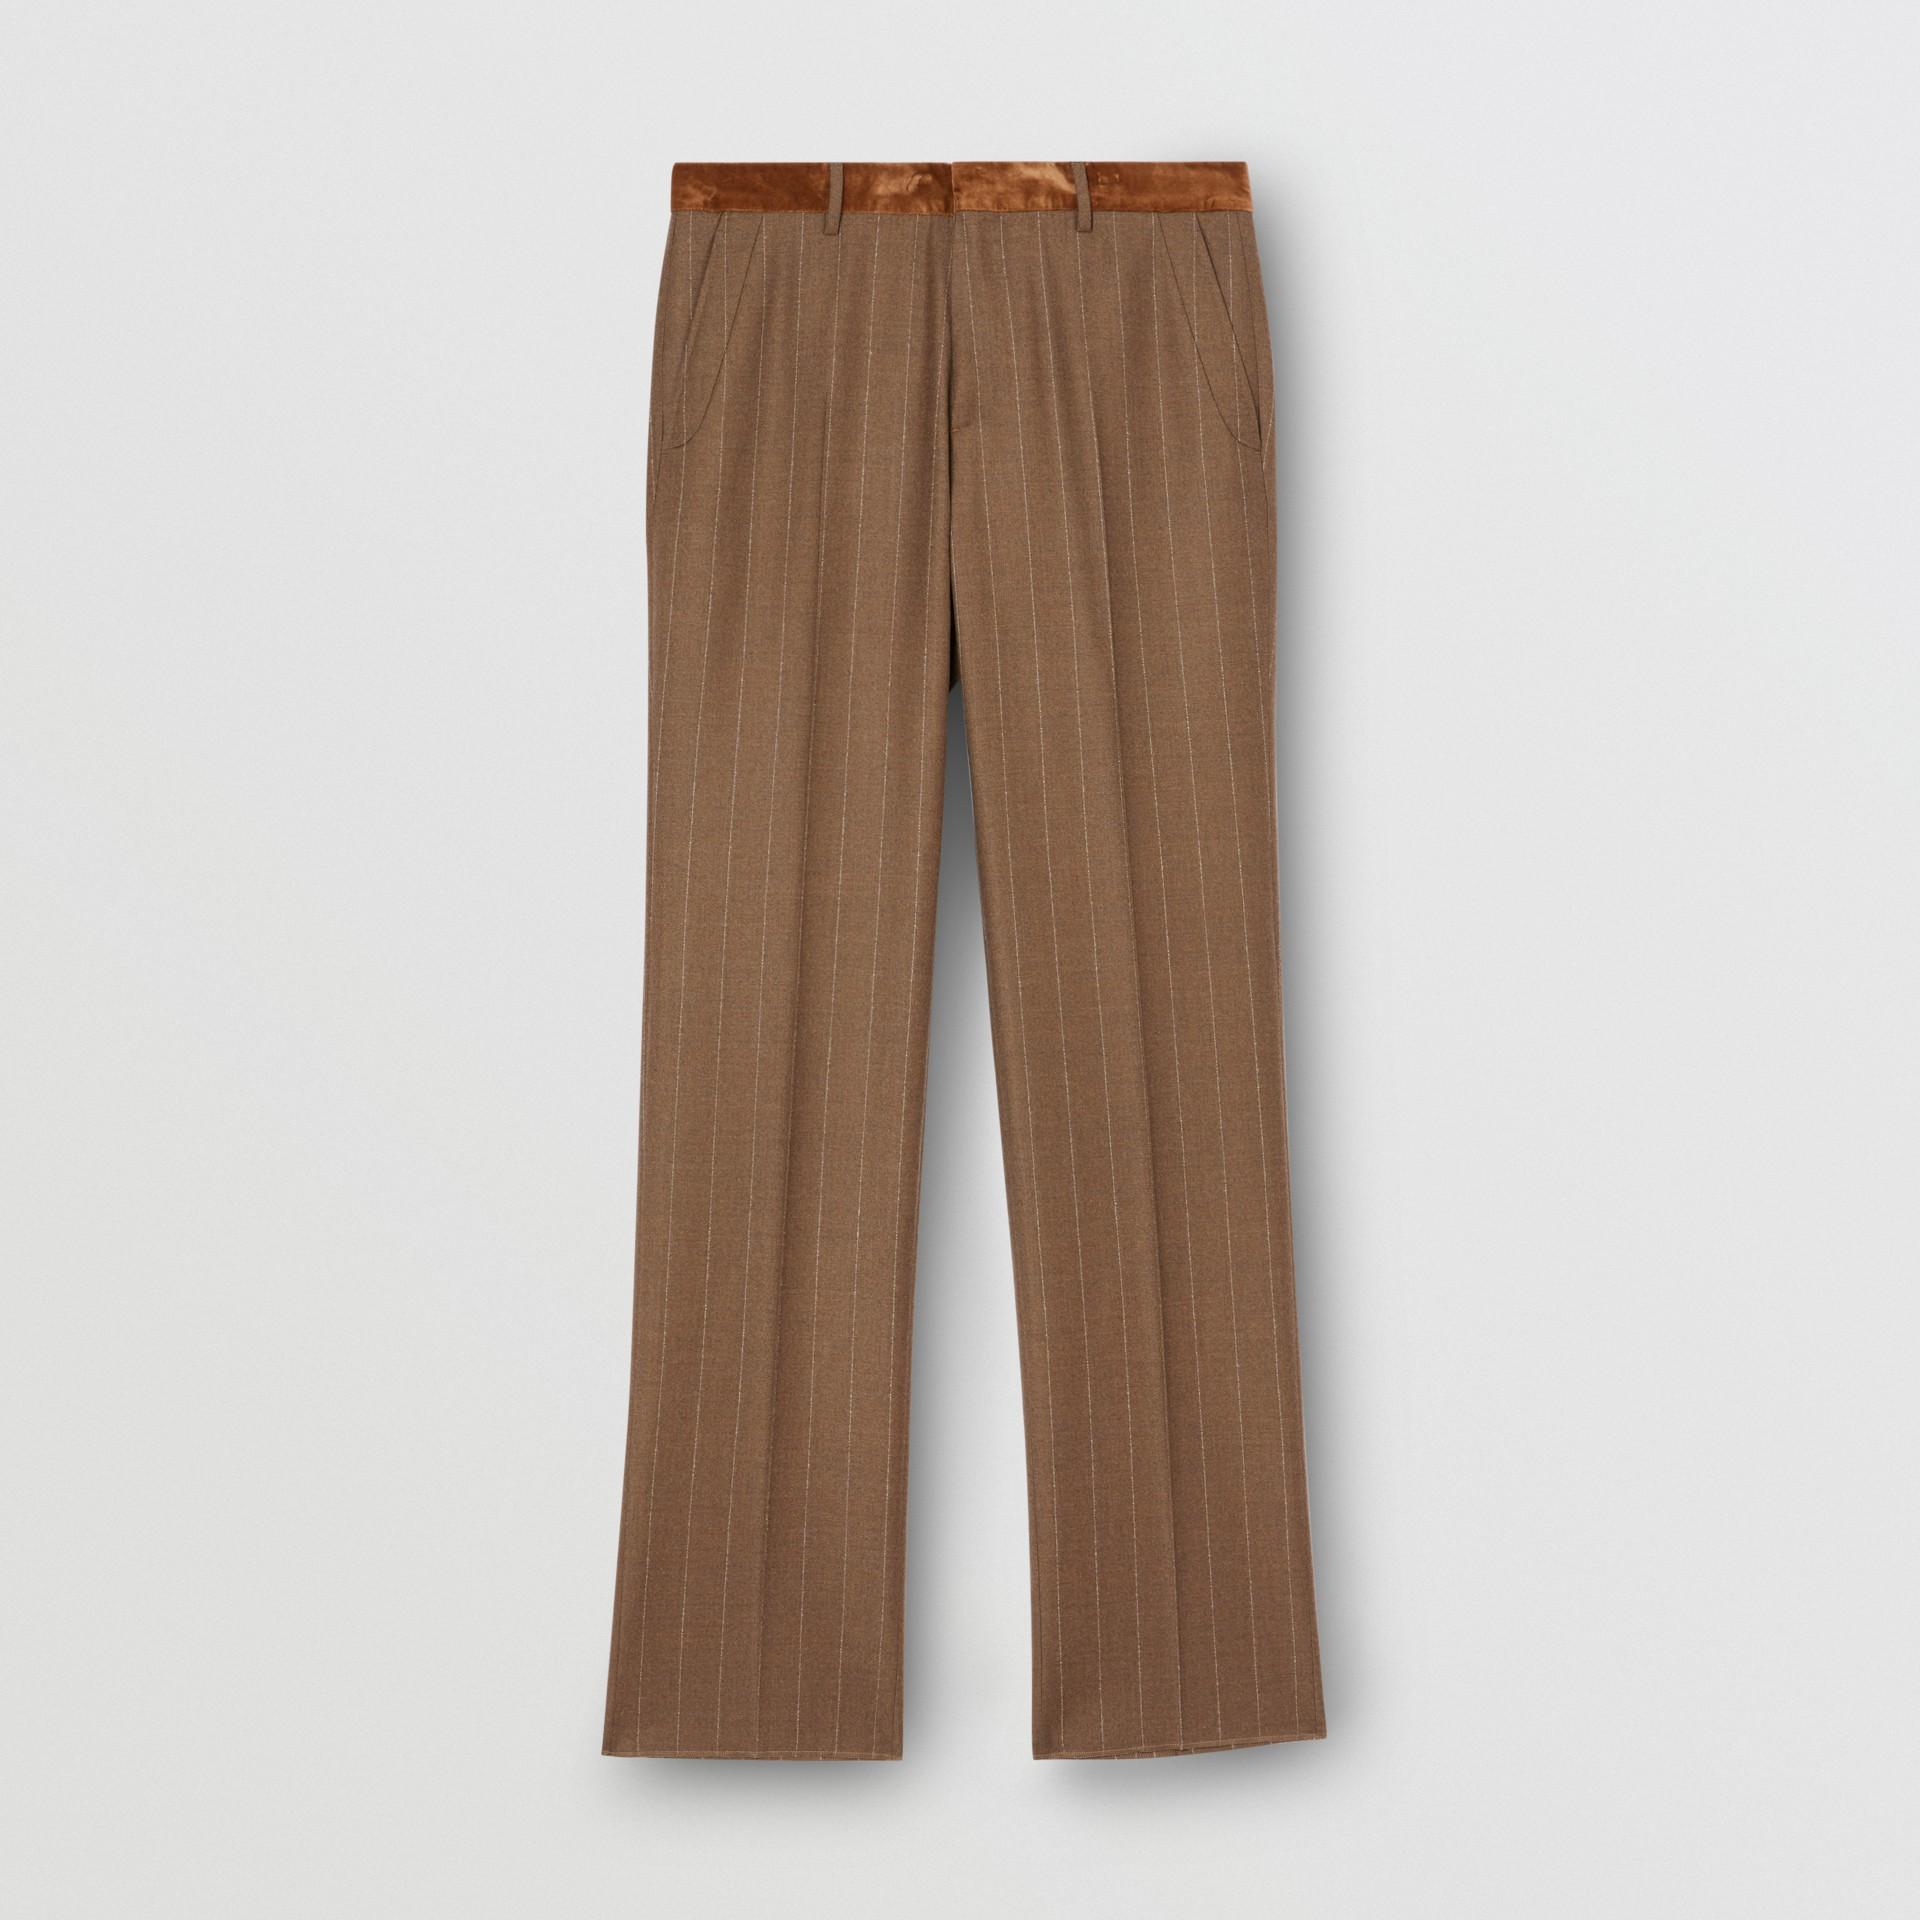 Classic Fit Velvet Trim Wool Cashmere Trousers in Dark Tan - Men | Burberry - gallery image 3